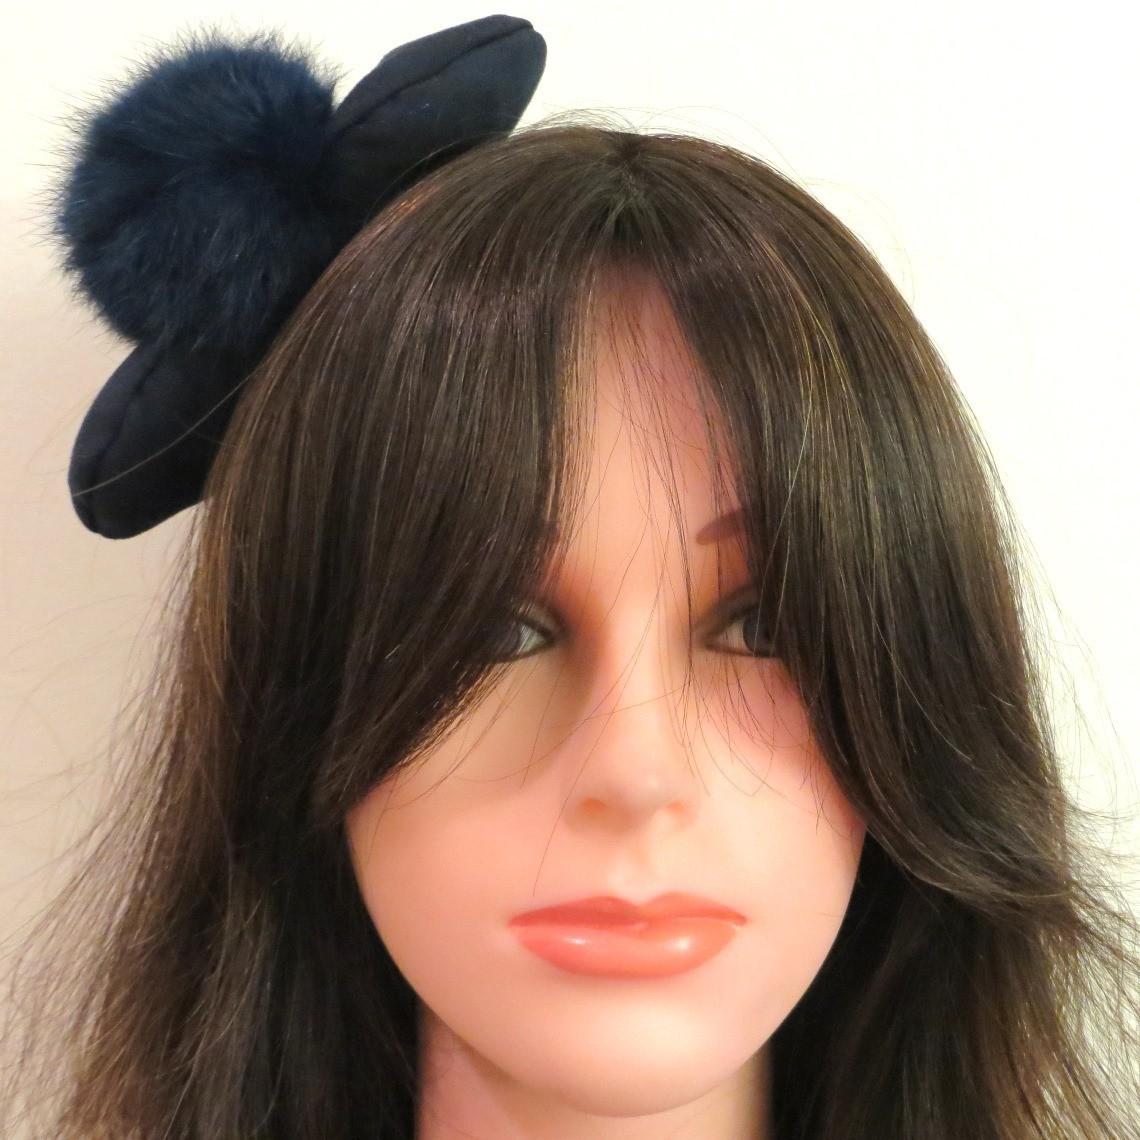 Blue bow and fur ball headband